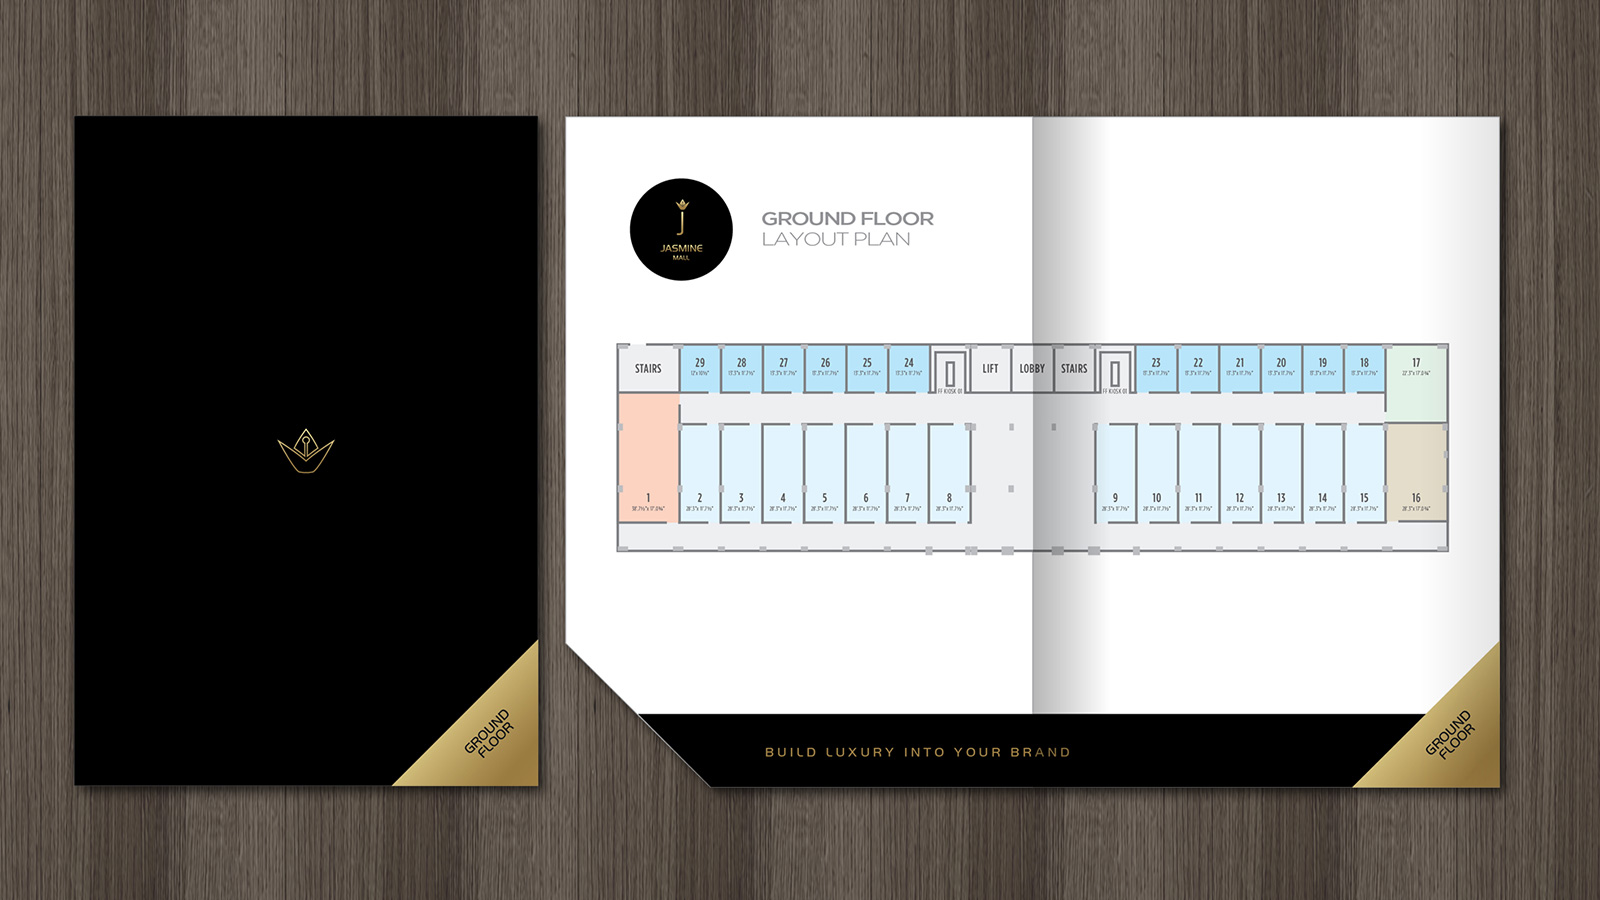 graphic-brand-design-web-designer-hiline-lahore-pakistan-jasmine-mall-014